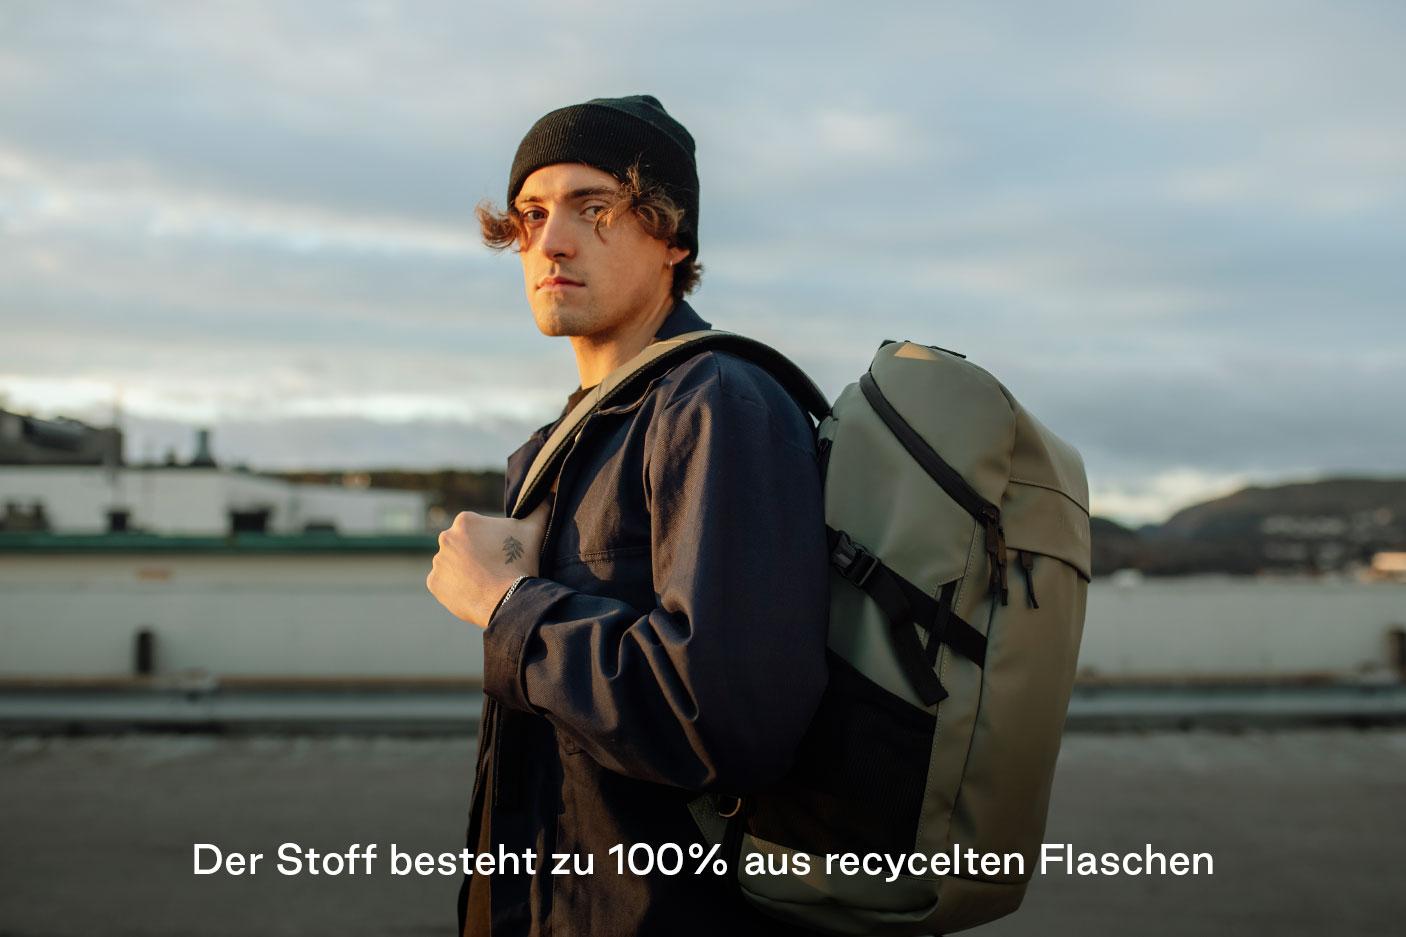 banner-youth-21-cstreet-flx-de